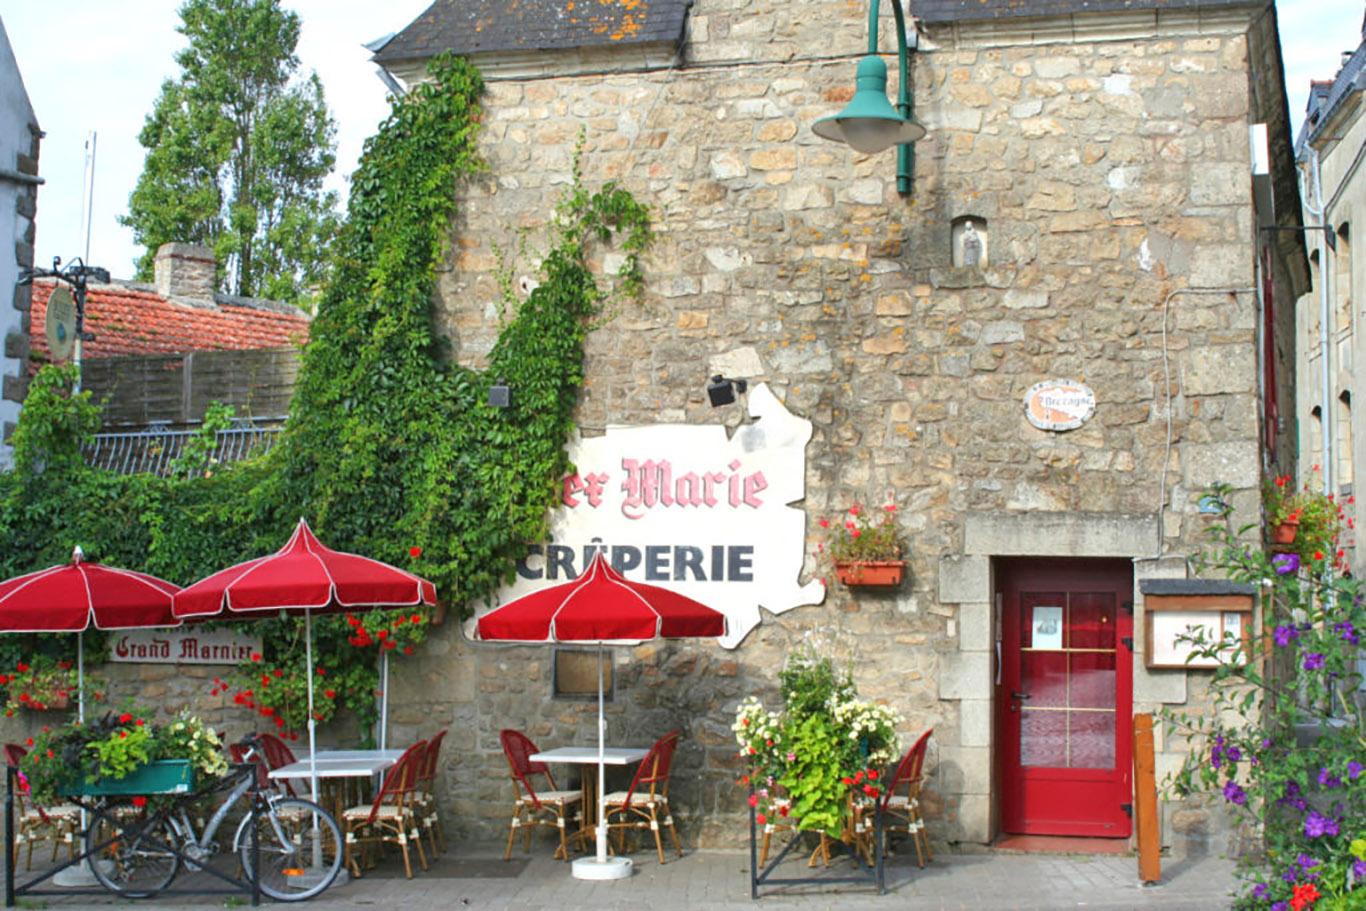 Una tipica casa bretone